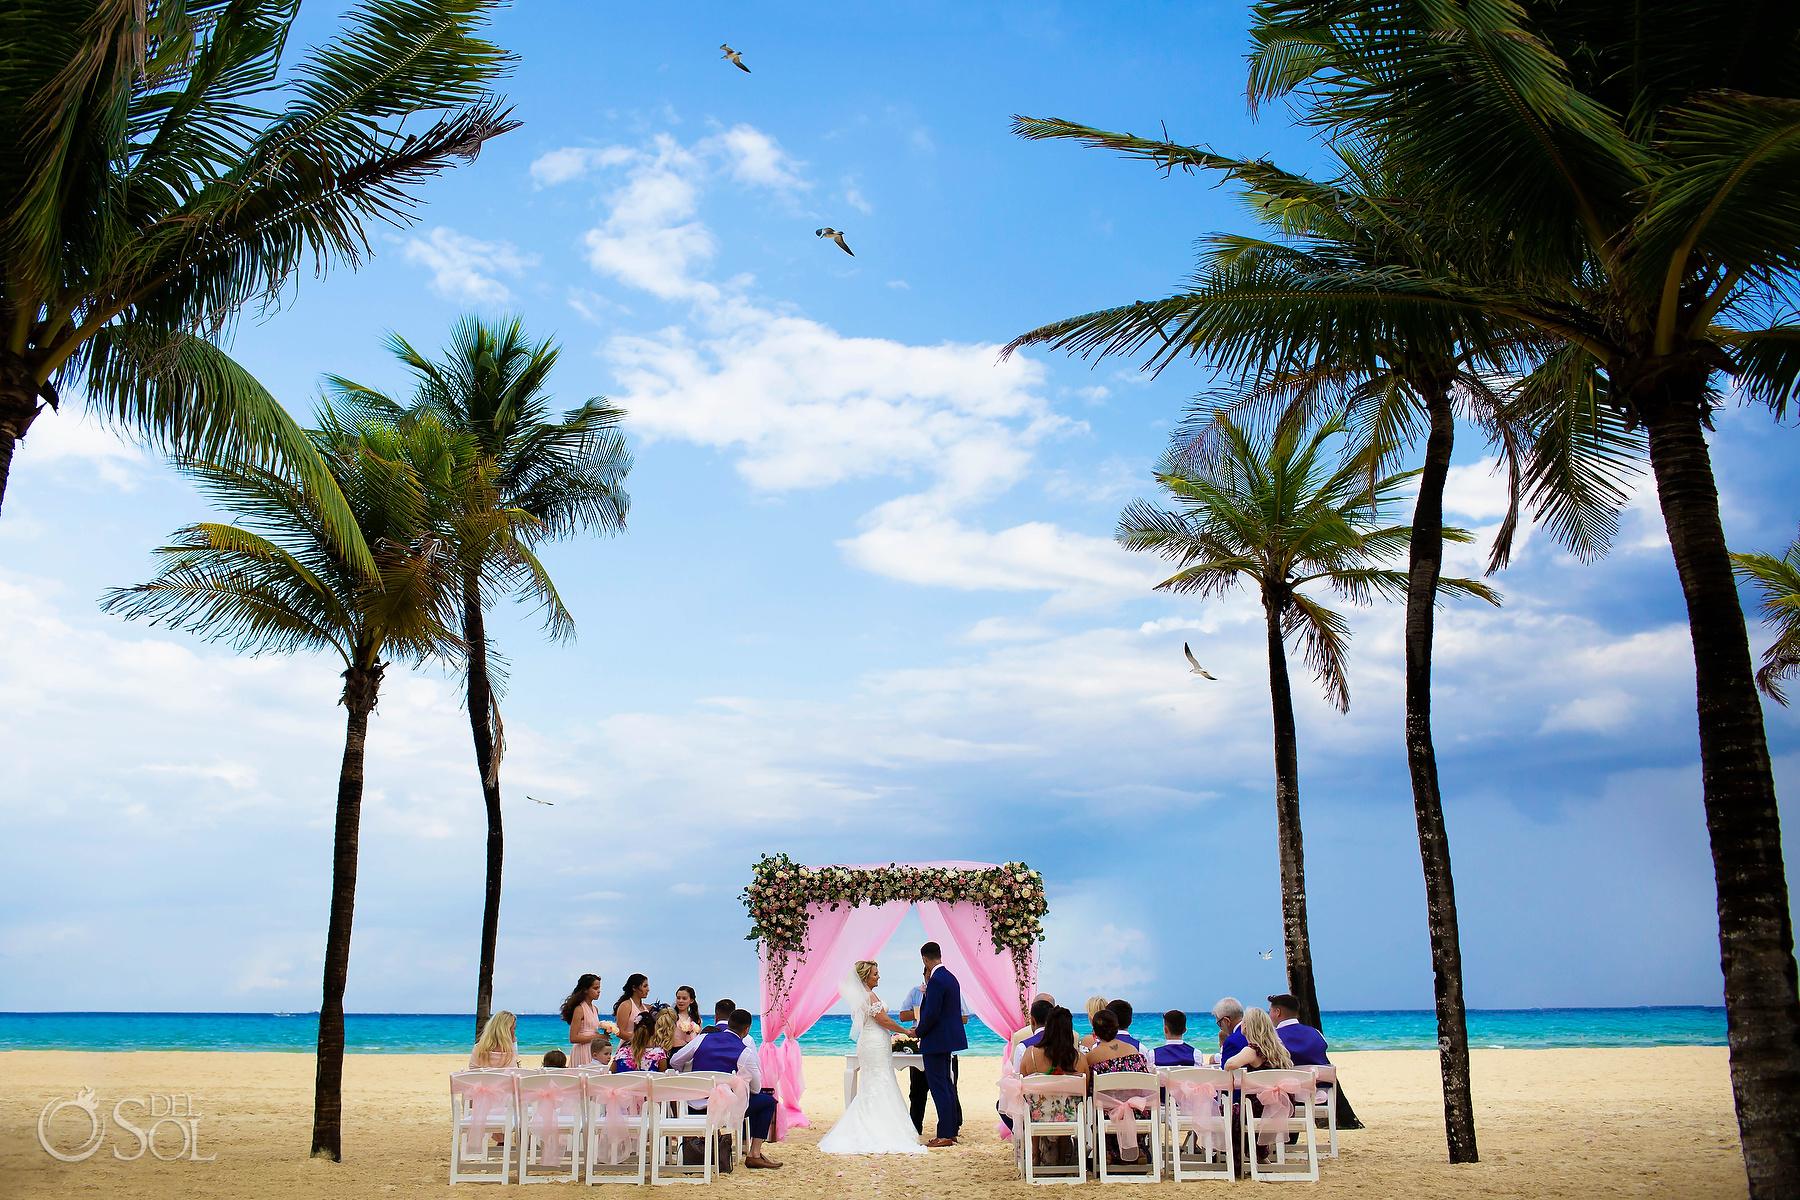 Riu Palace Mexico wedding photographer beach ceremony set up Playa del Carmen Mexico